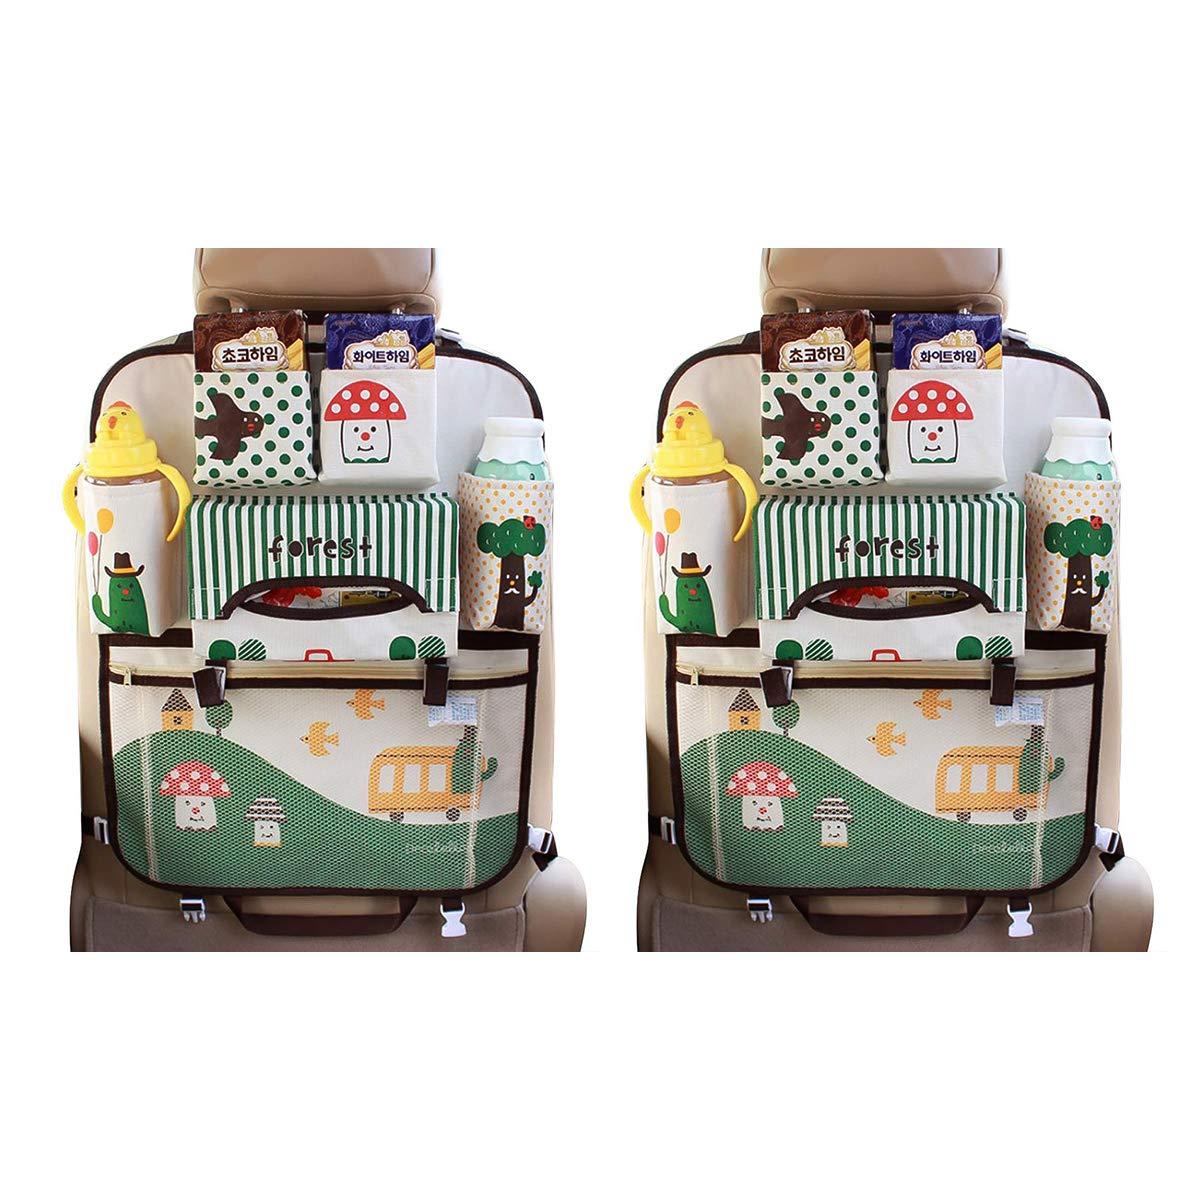 Ergocar Car Organiser Cartoon Kick Mats for Car Kick Mat Car Back Seat Protector Car Seat Organiser with Insulation Bags Hanging Muti-Pockets Storage for Kids Toy Storage Little Girl